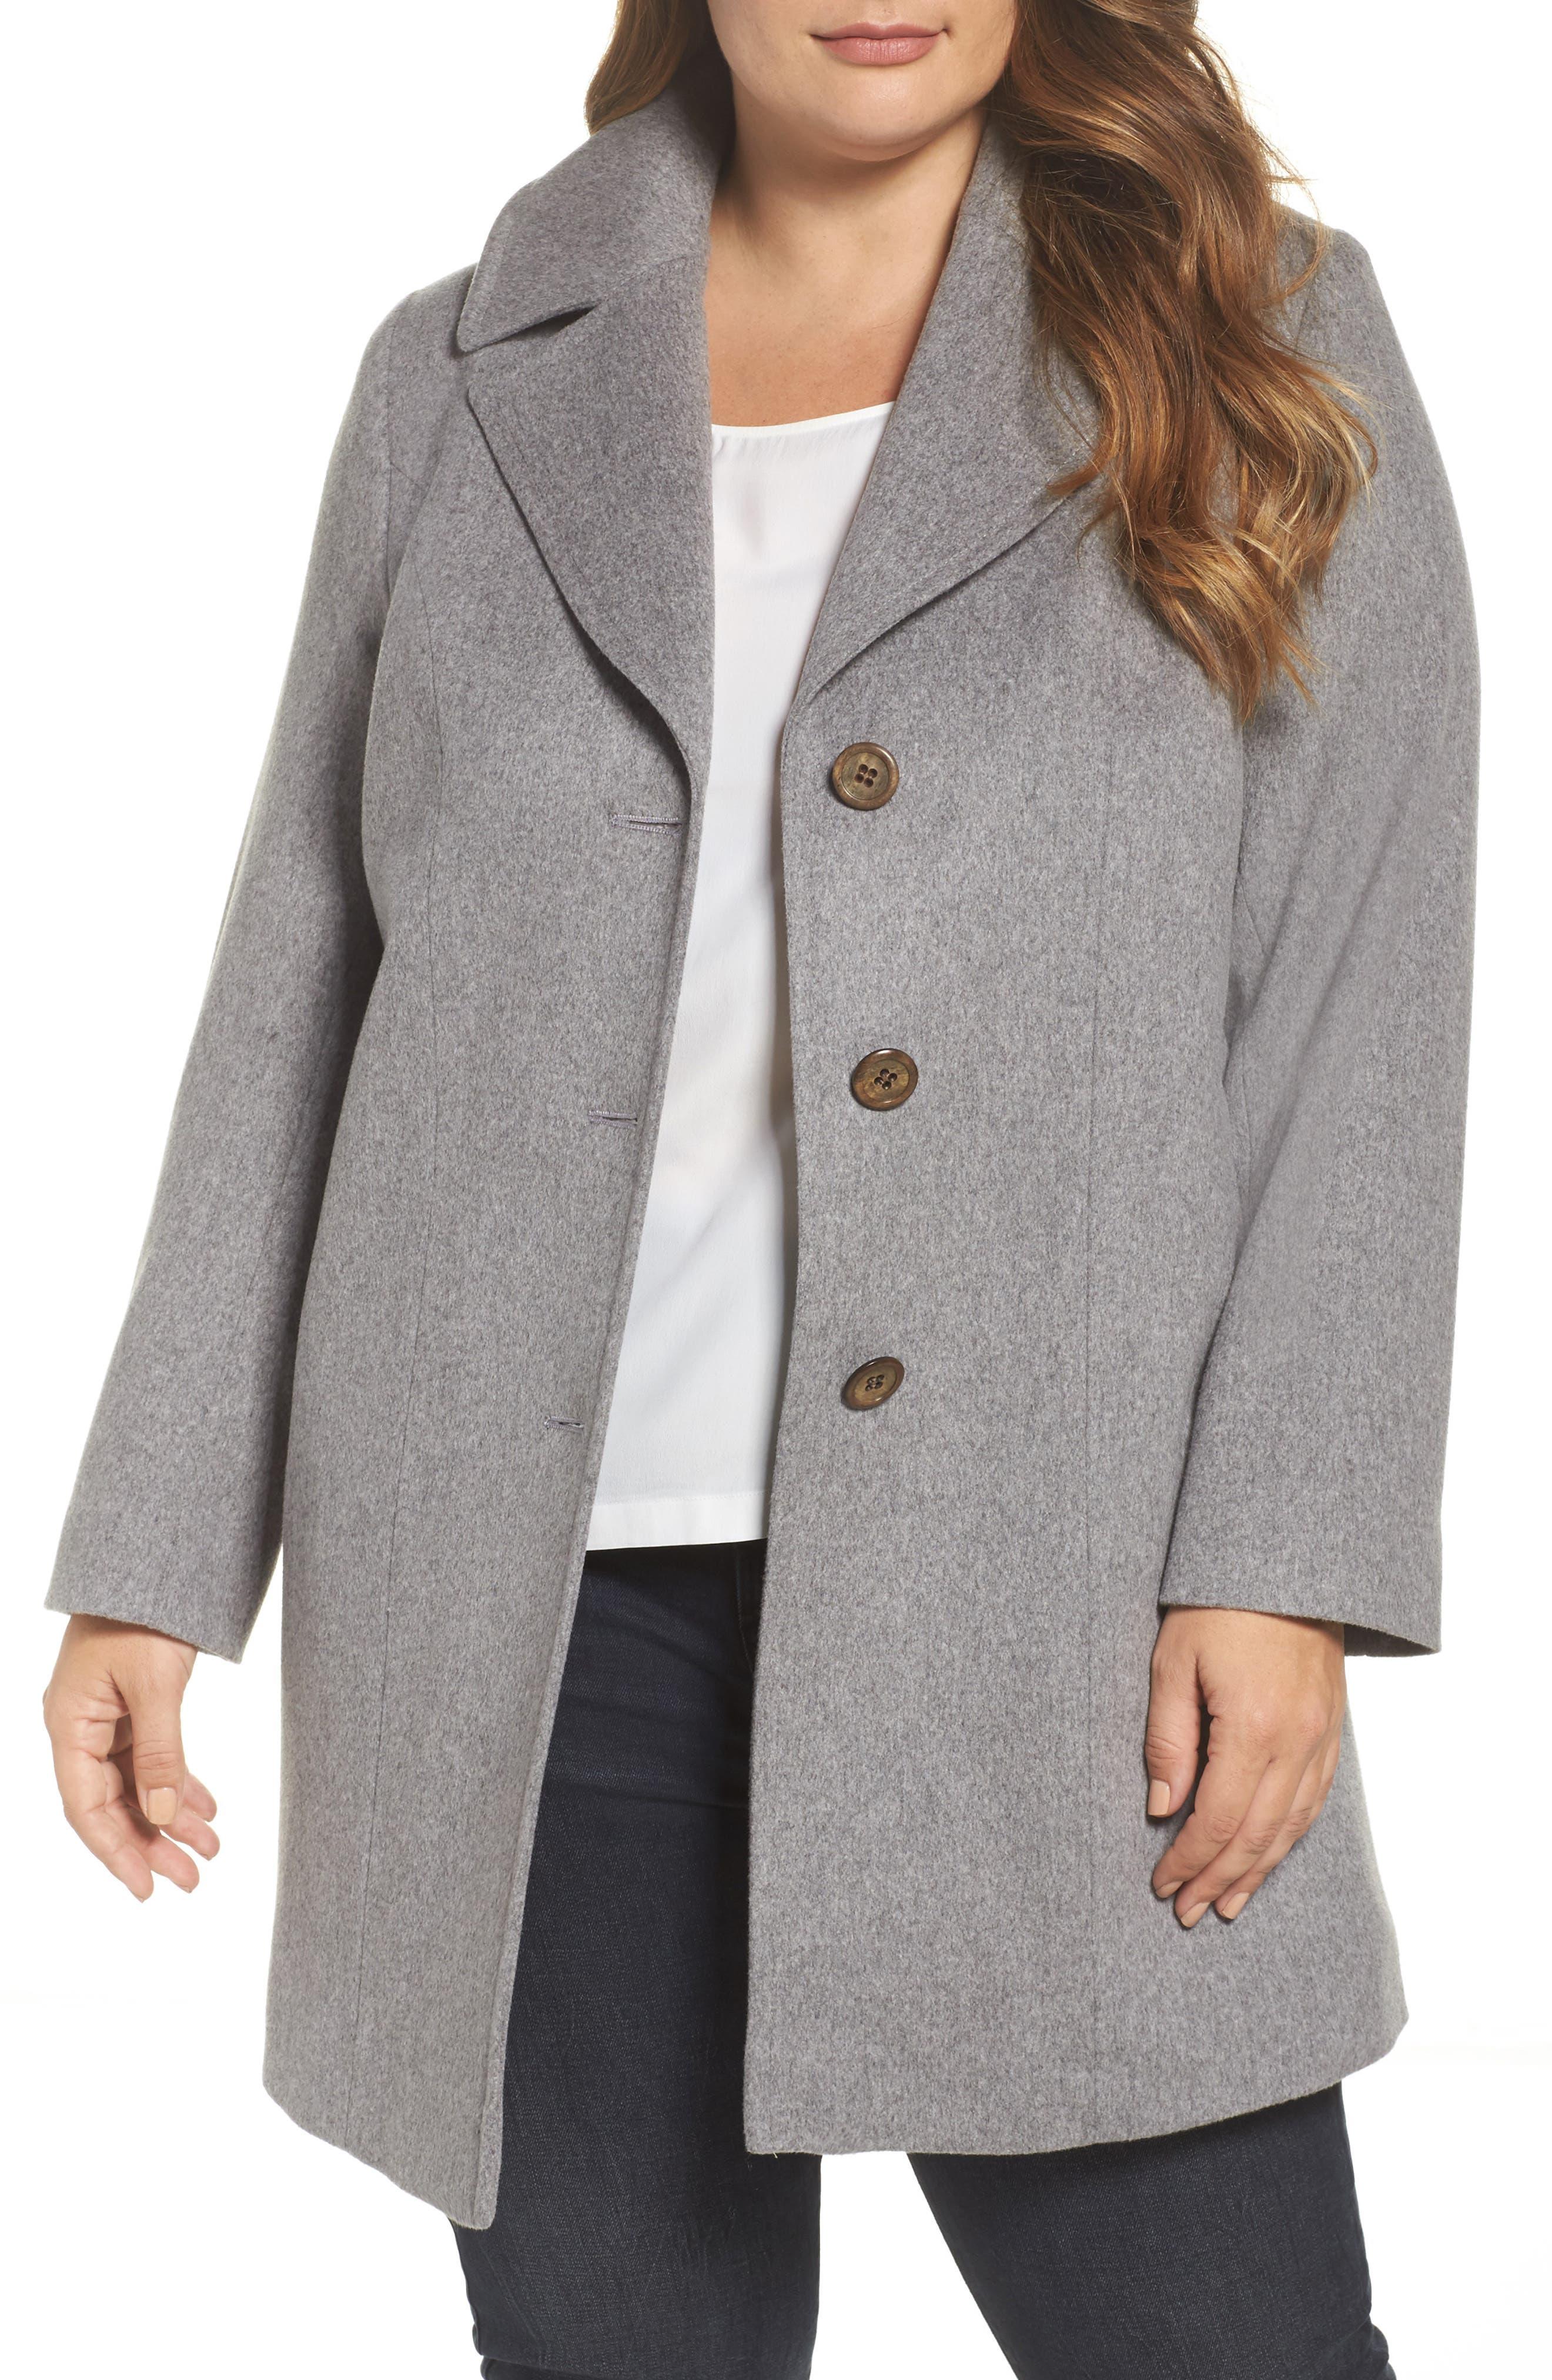 Wool Walking Coat,                         Main,                         color, Grey Heather